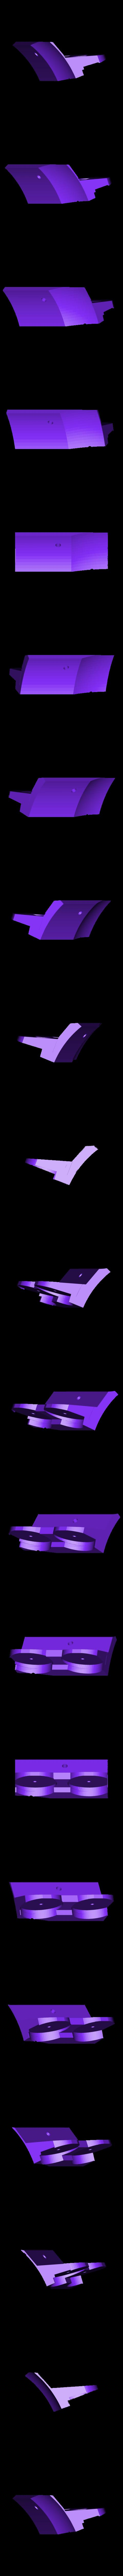 Accy-Parts-RH-Base101.stl Download free STL file Turboprop Engine • 3D printable model, konchan77